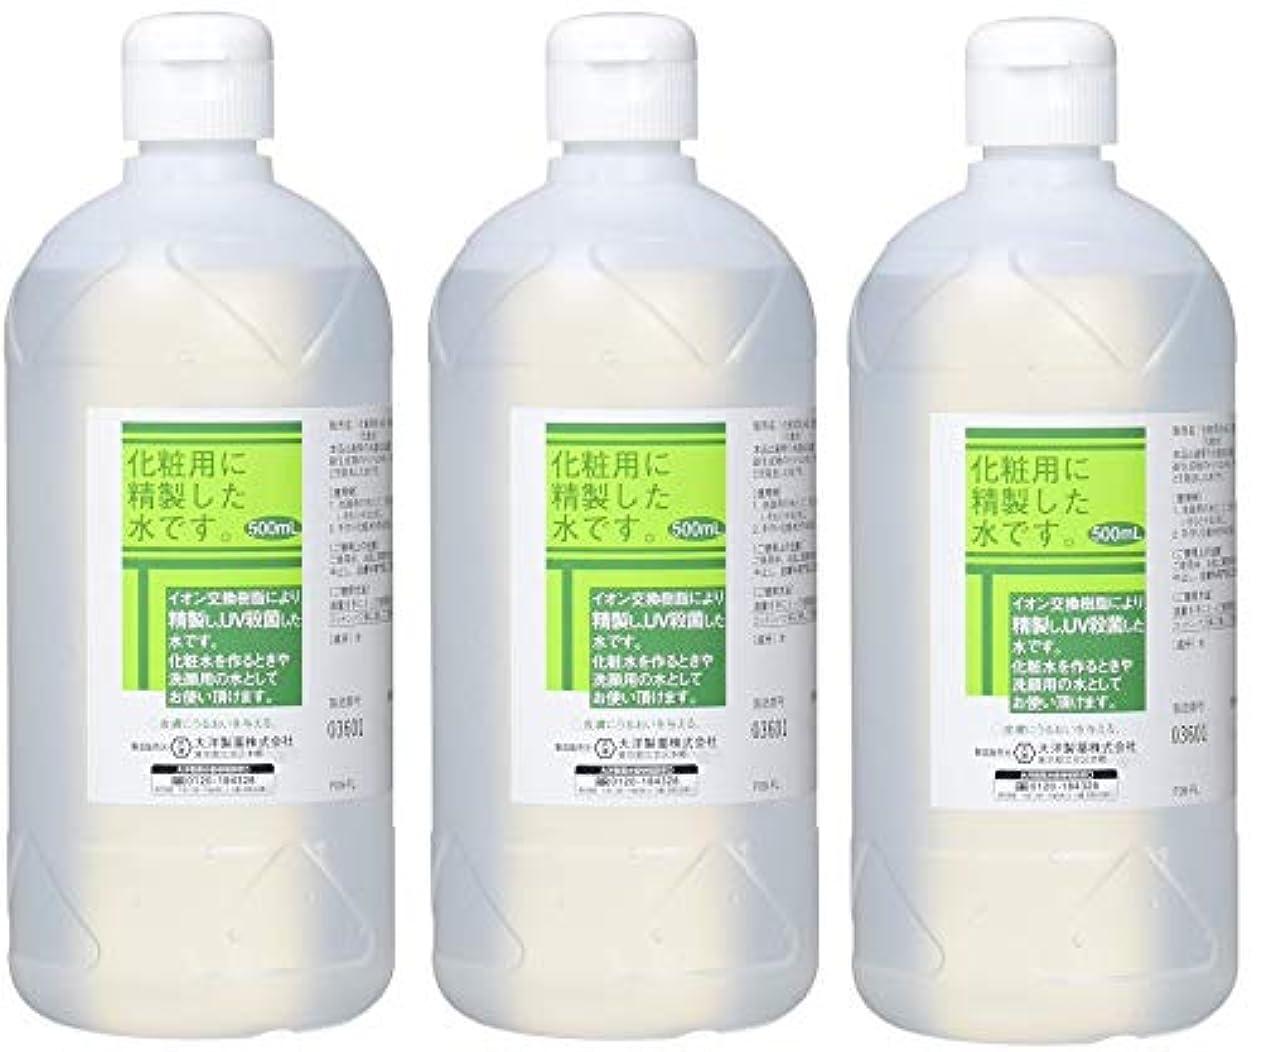 パス良心的大胆大洋製薬 化粧用水 500ML【3個セット】